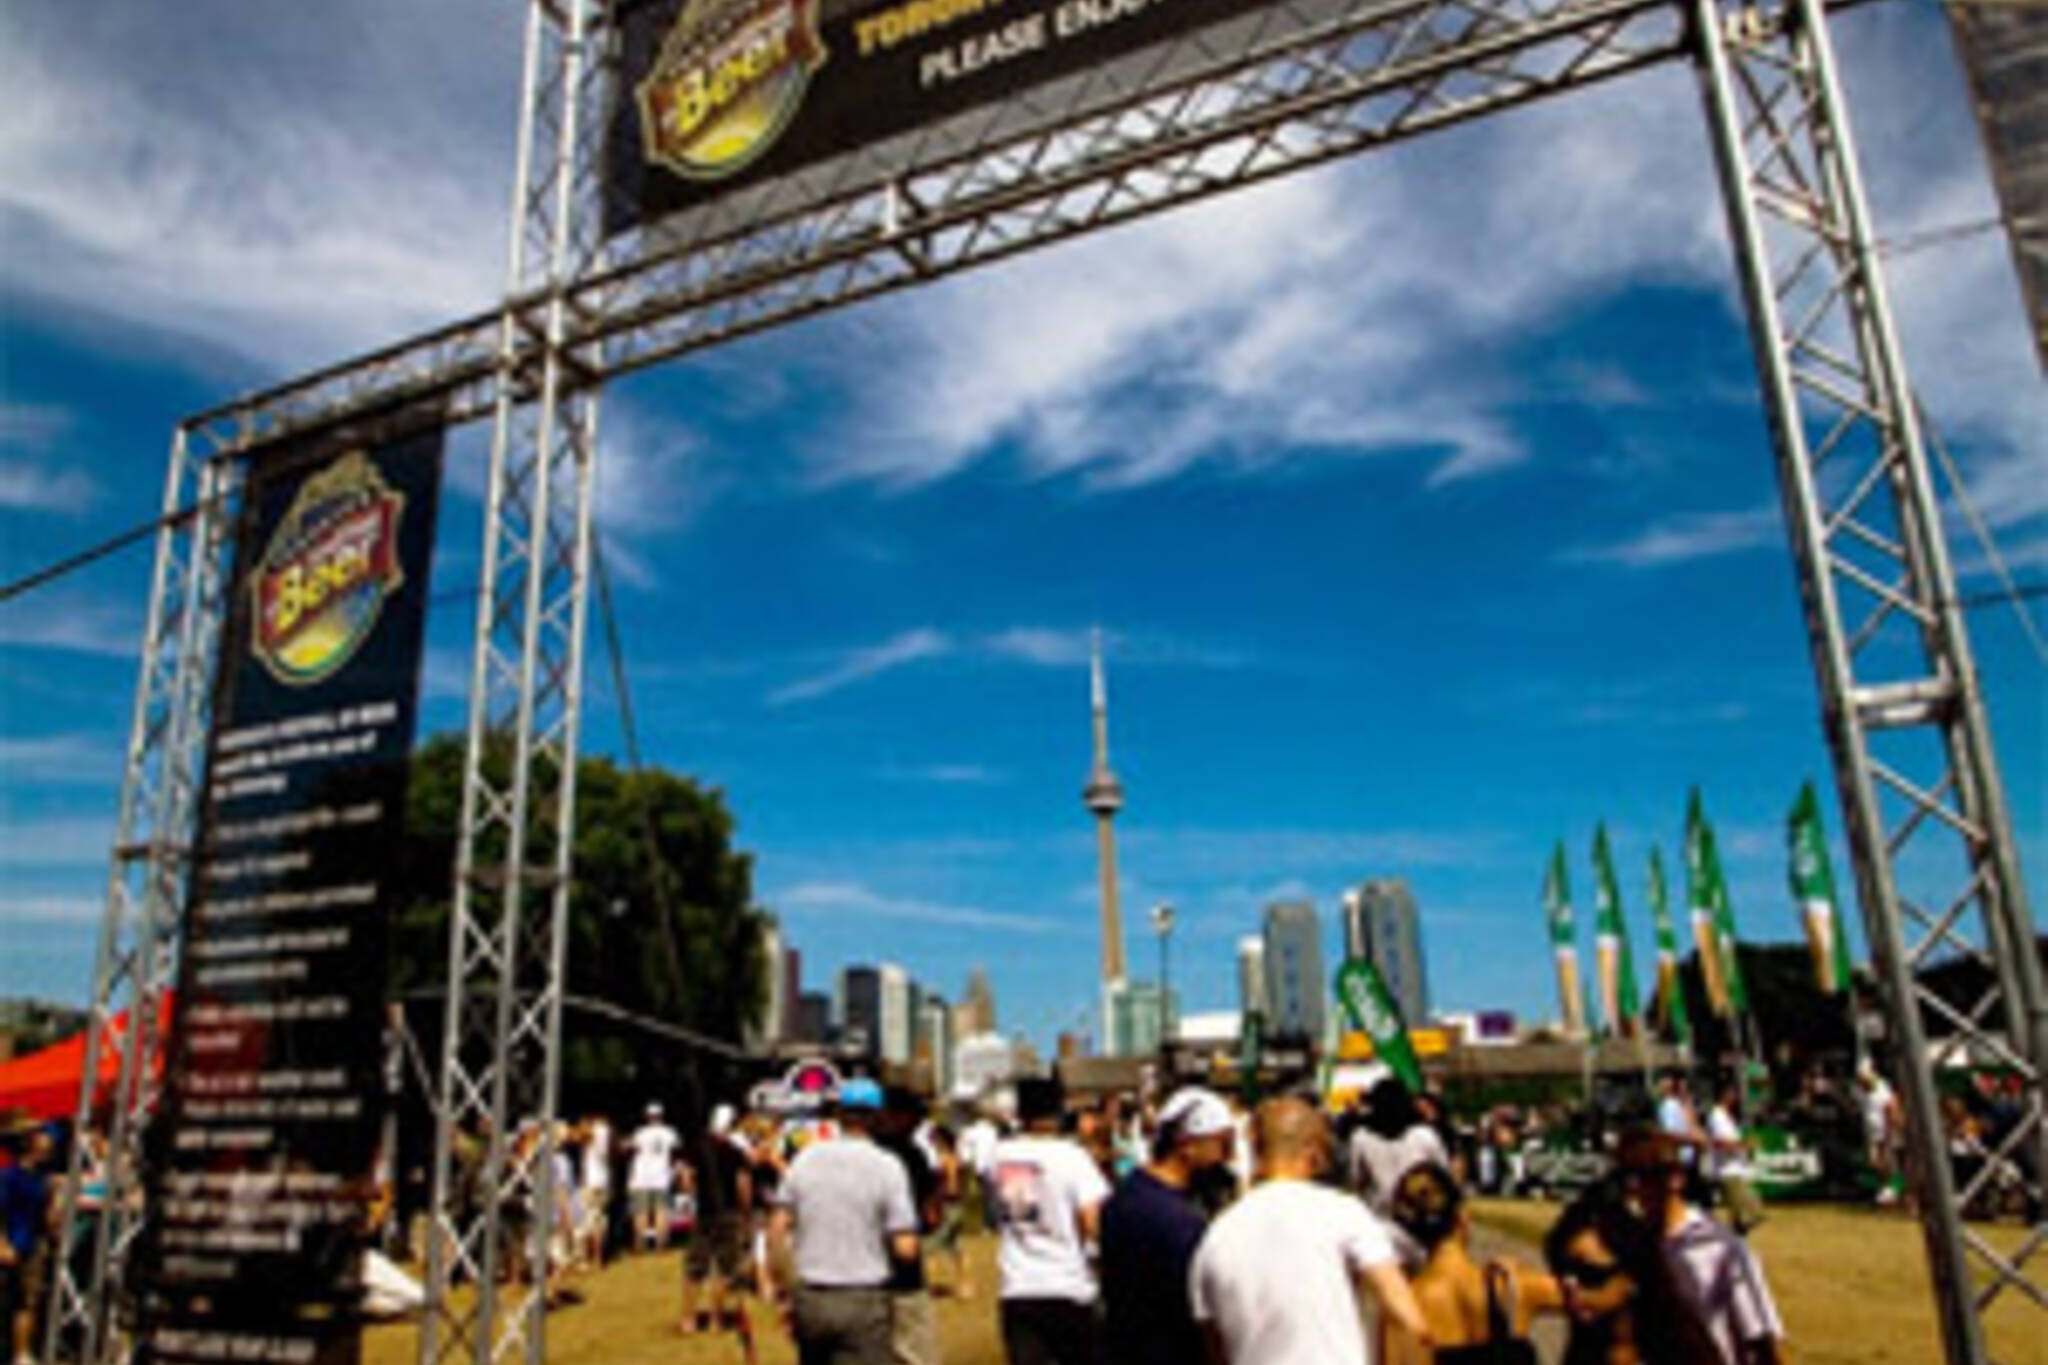 Beerlicious Beer Festival